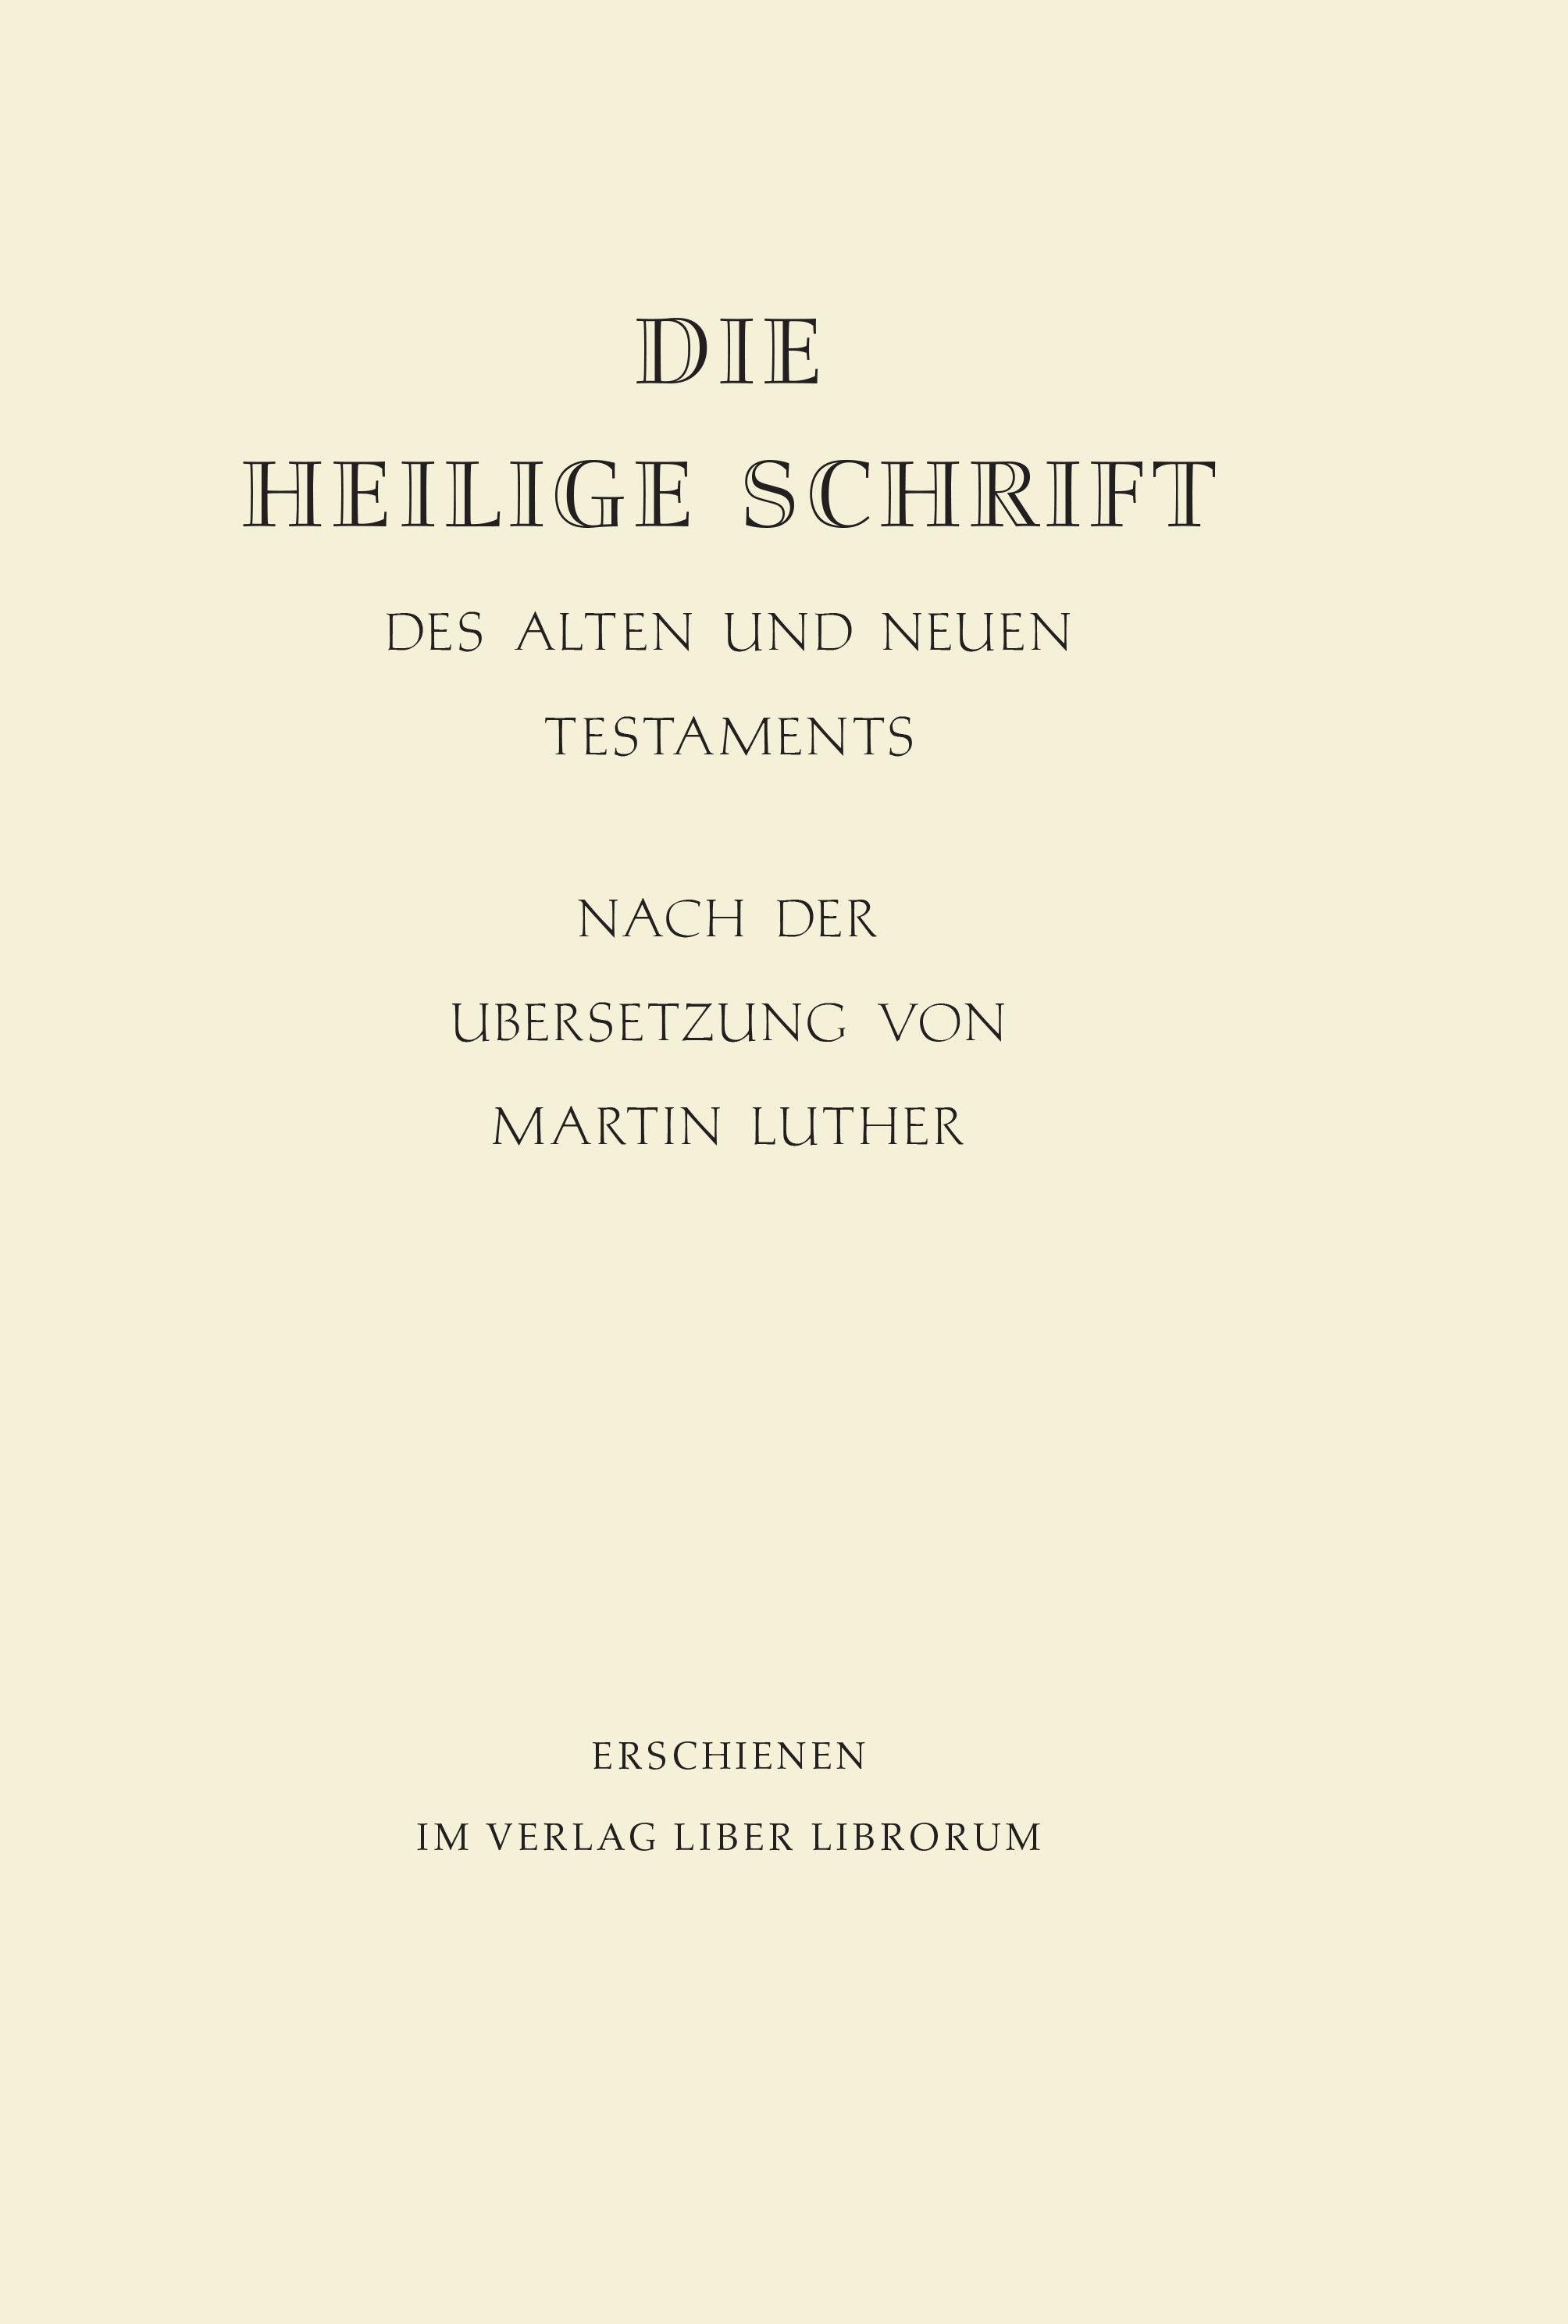 GOTTHARD DE BEAUCLAIR  Germany, 1955  Aldus, Medici, Smargard  17 X 25.2 cm  Letterpress  Liber Librorum Collection